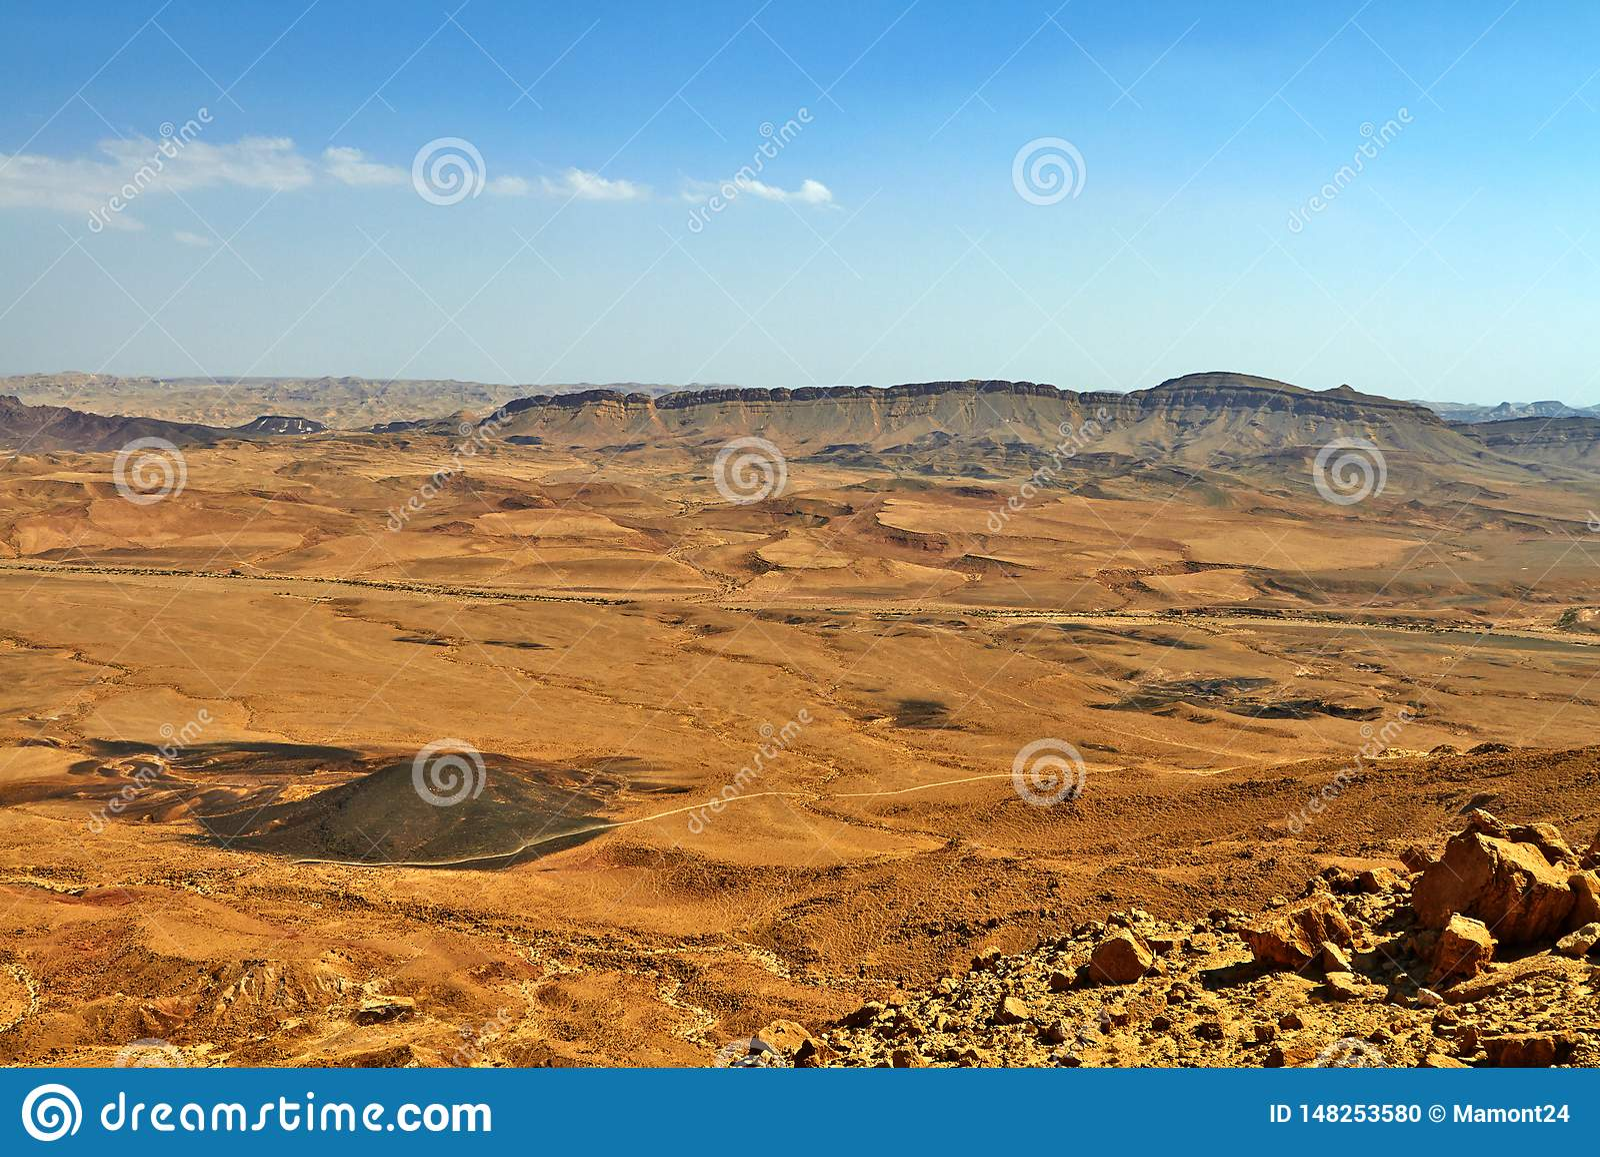 Ramon Crater in Israel Negev Desert